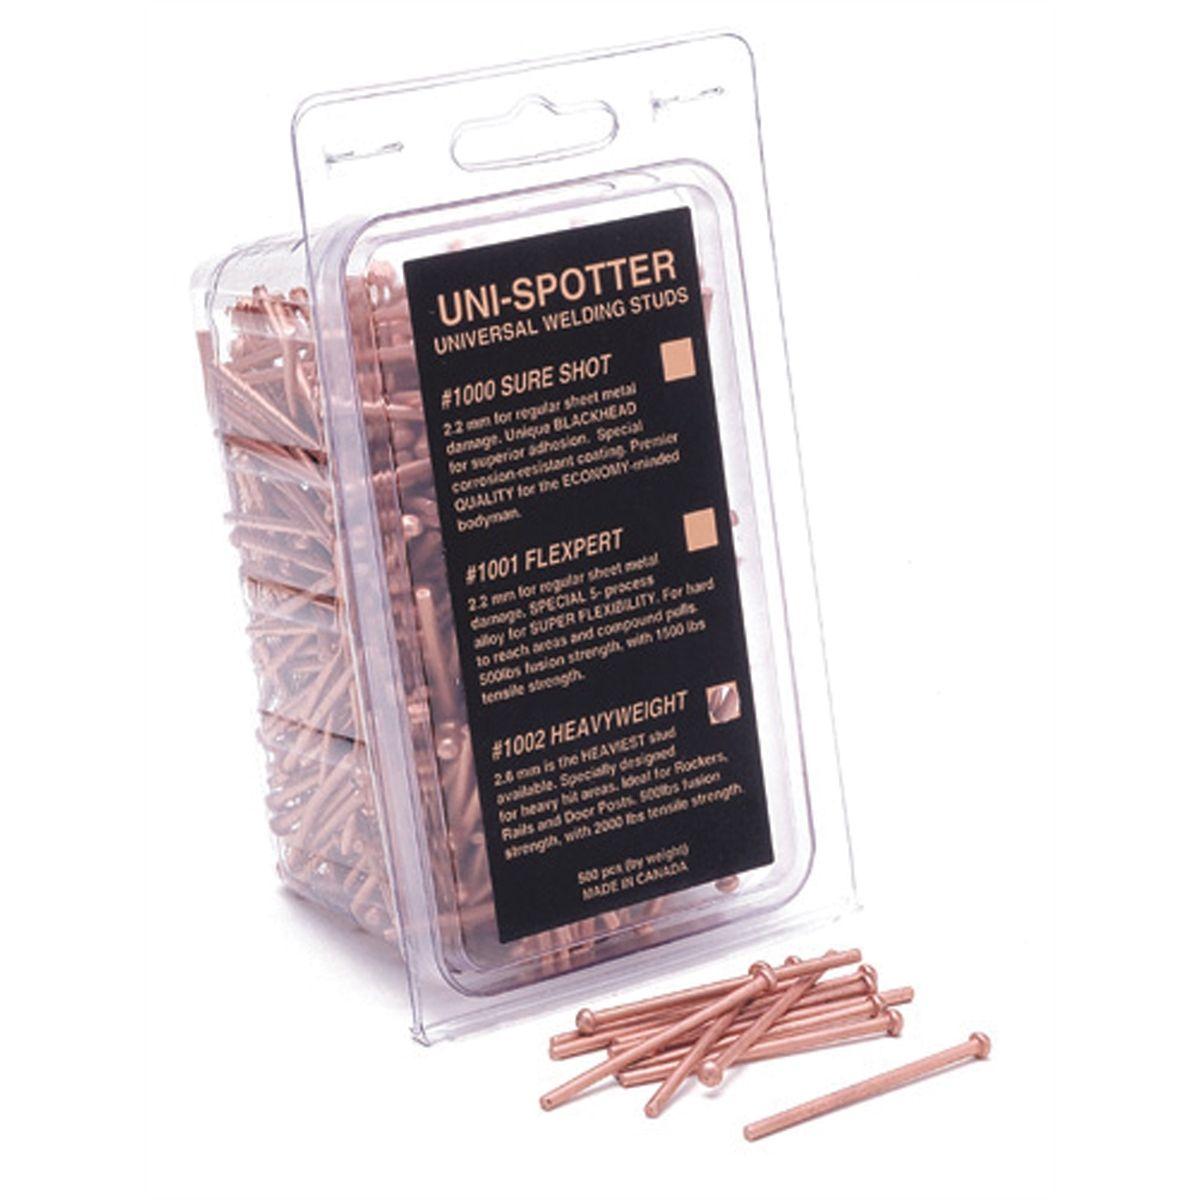 2.6mm Heavy Weight Studs 500 per pack UNI-1002 Brand New!